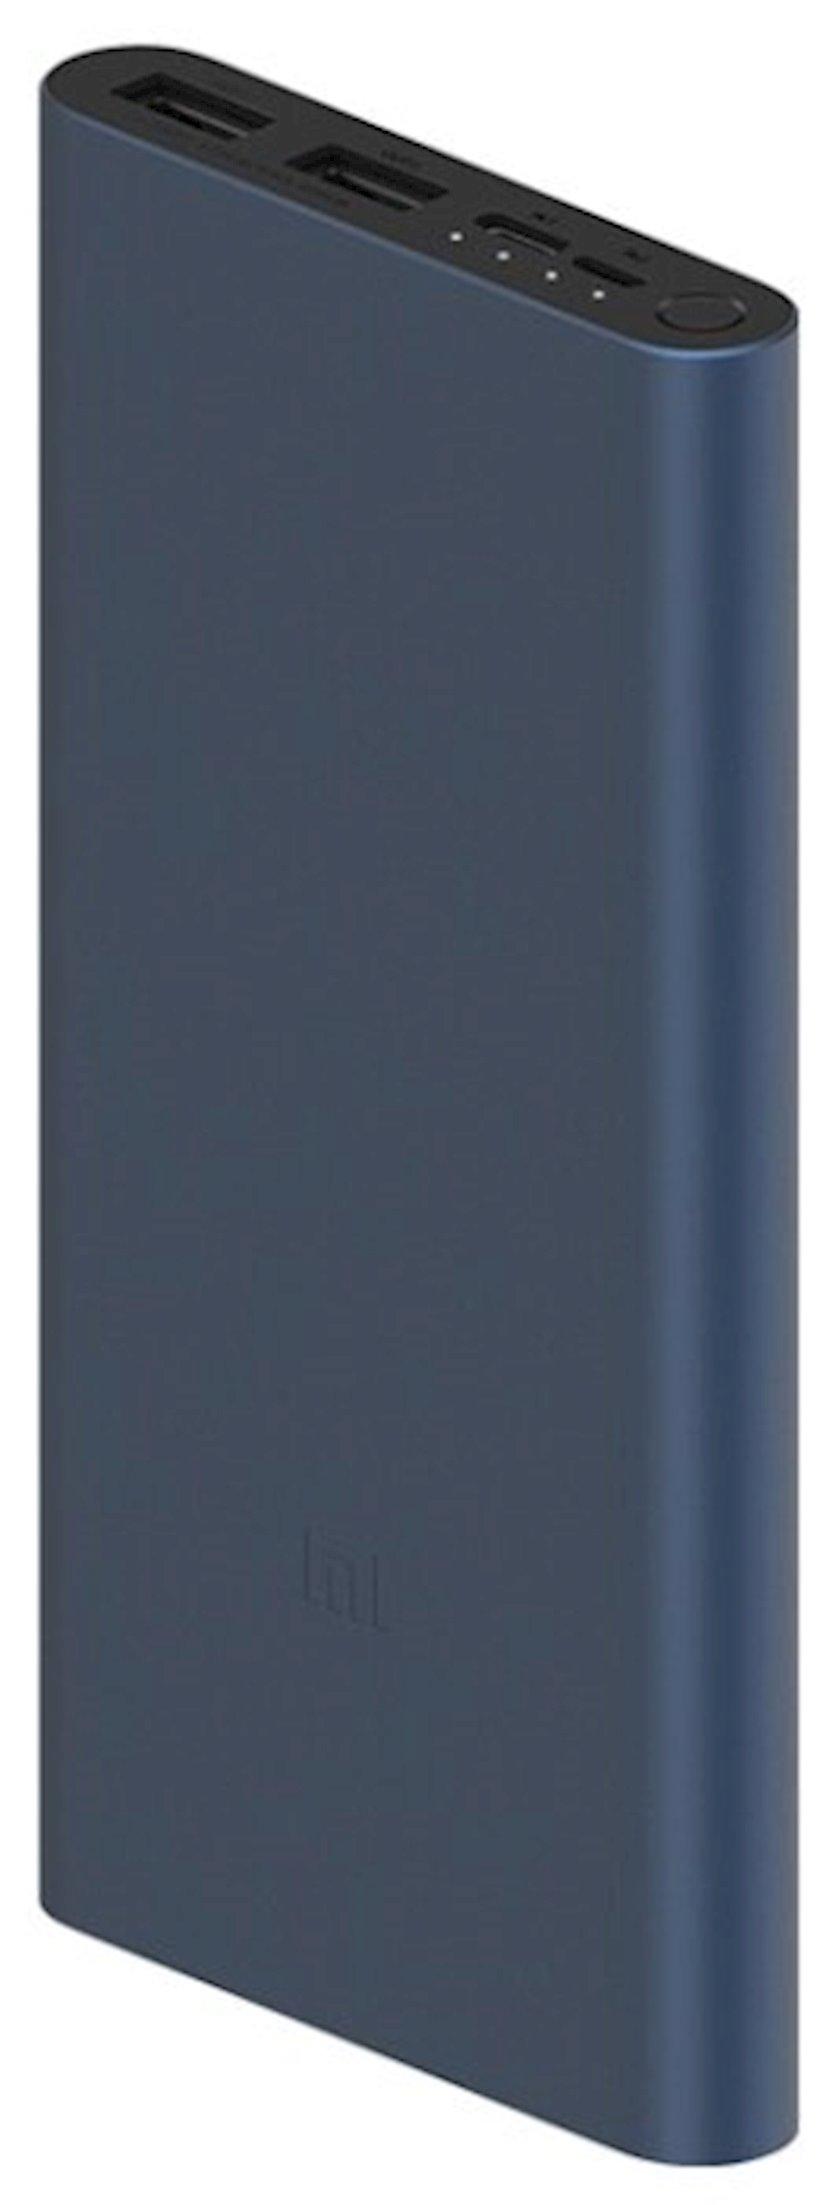 Xarici batareya Xiaomi Mi Power Bank 3 Fast Charge qara